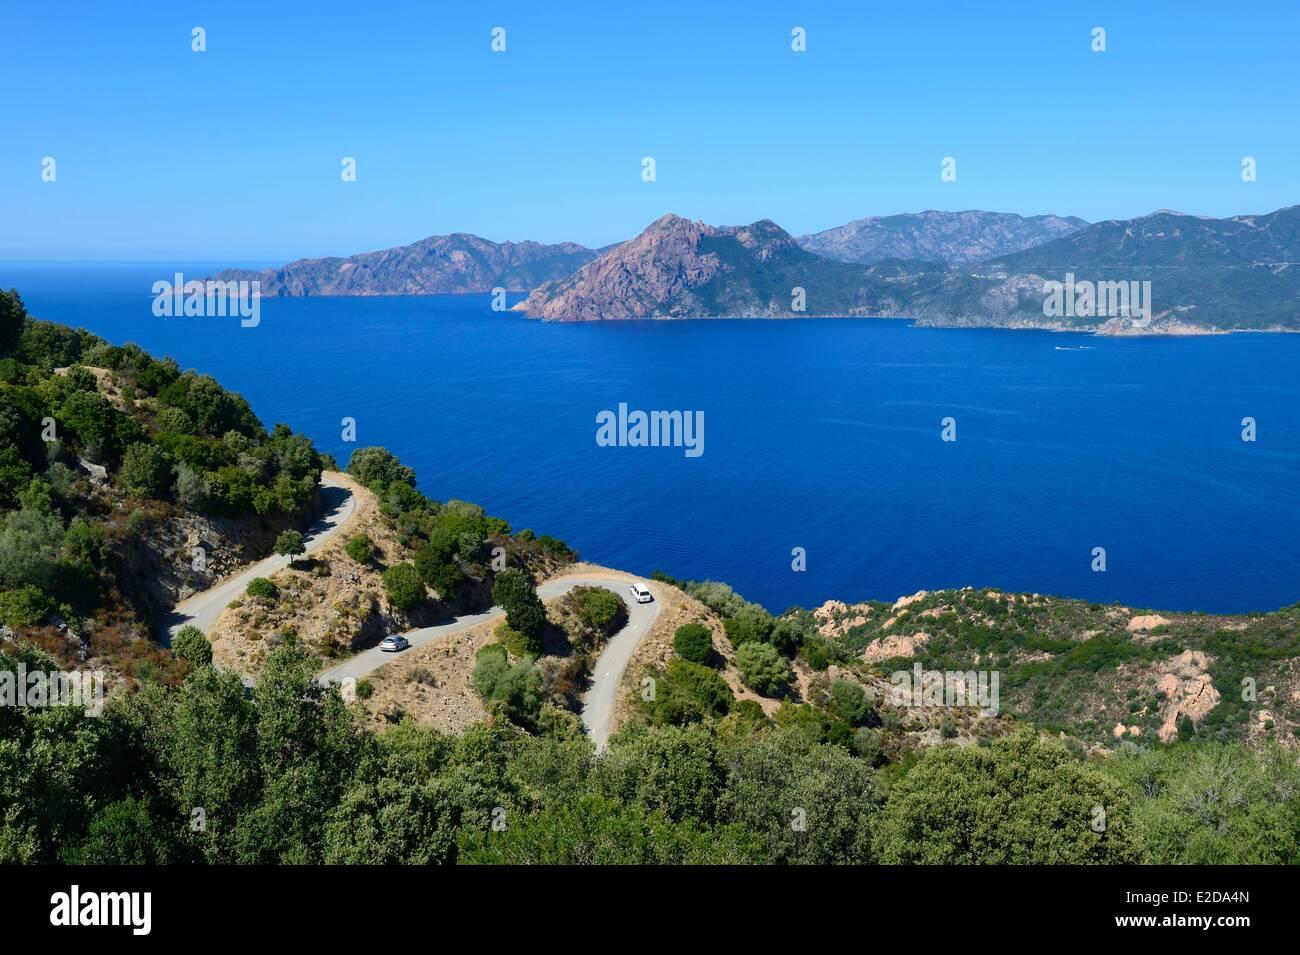 Frankreich, Corse du Sud, Golfe de Porto, Weltkulturerbe der UNESCO, Piana, Ficajola-Bucht Stockbild